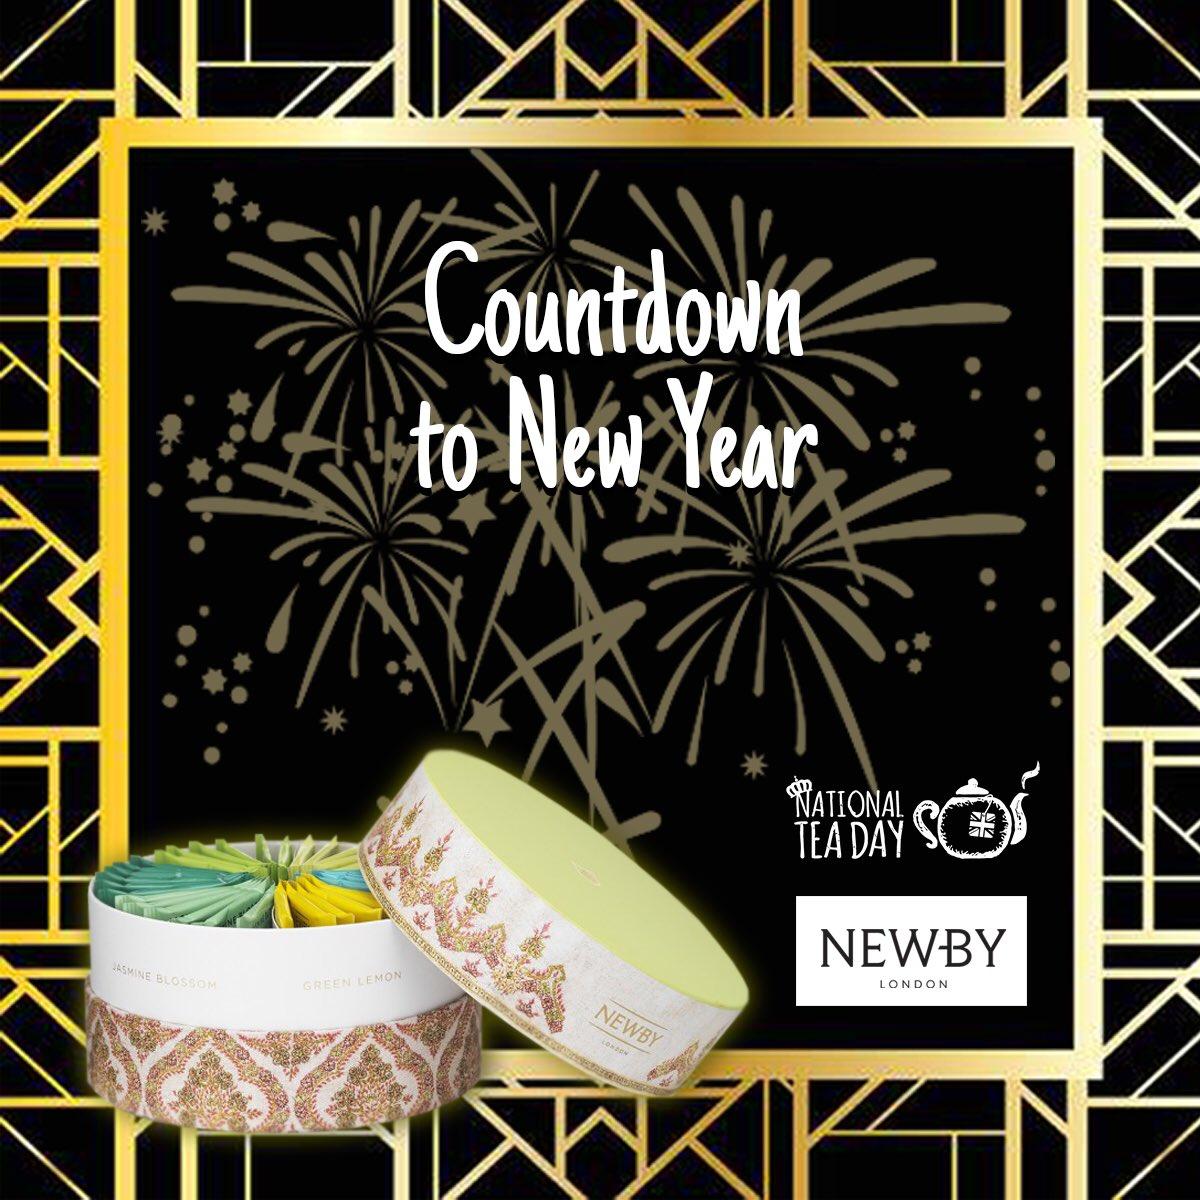 Newby Teas Newbyteas Twitter Kia Picanto Fuse Box Layout National Tea Dayverified Account Nationalteaday